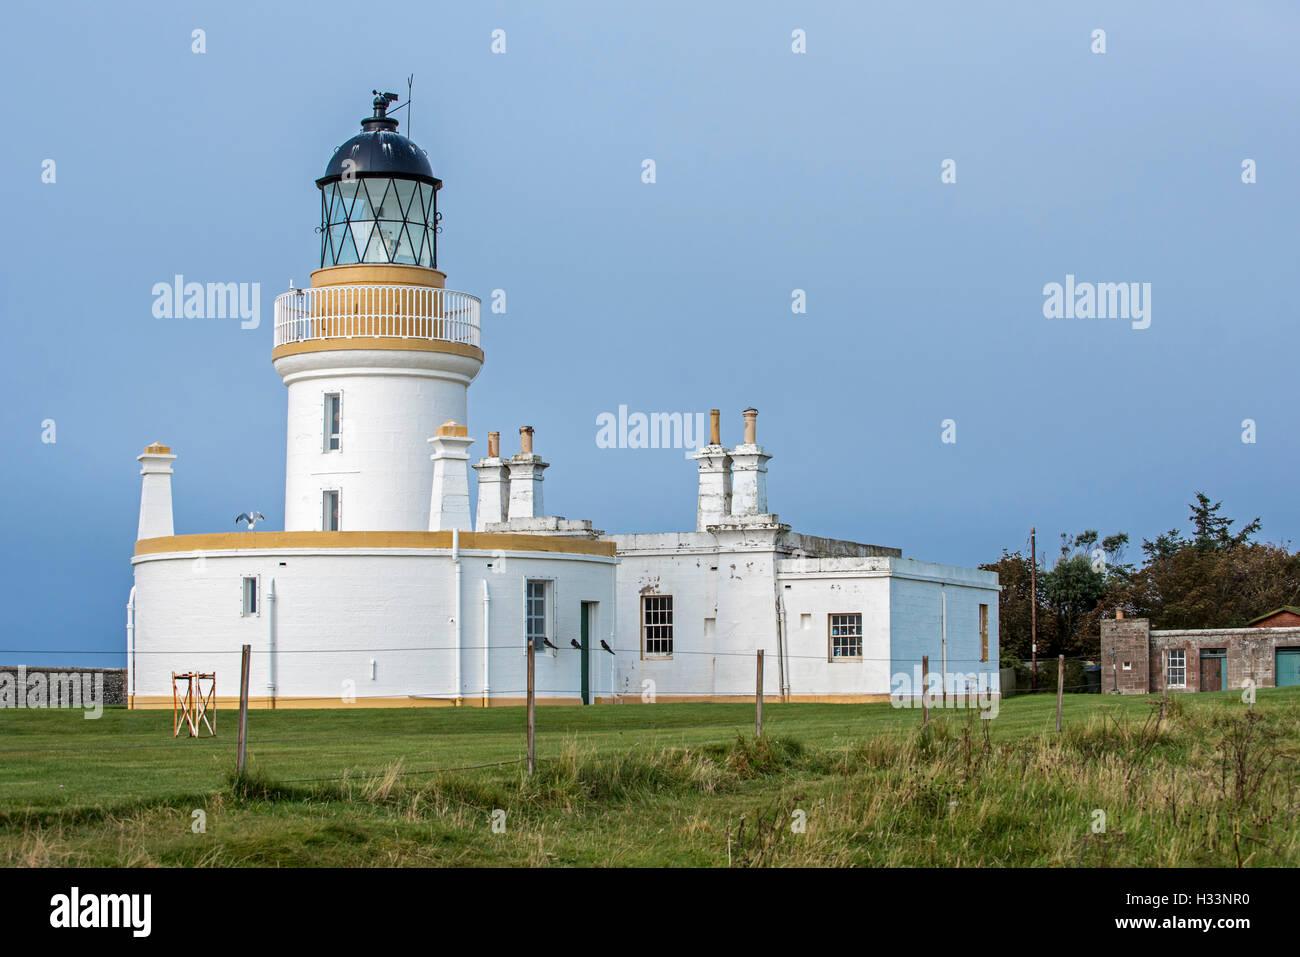 Lighthouse at Chanonry Point on the Black Isle, Moray Firth, Scotland, UK, Scotland, UK - Stock Image